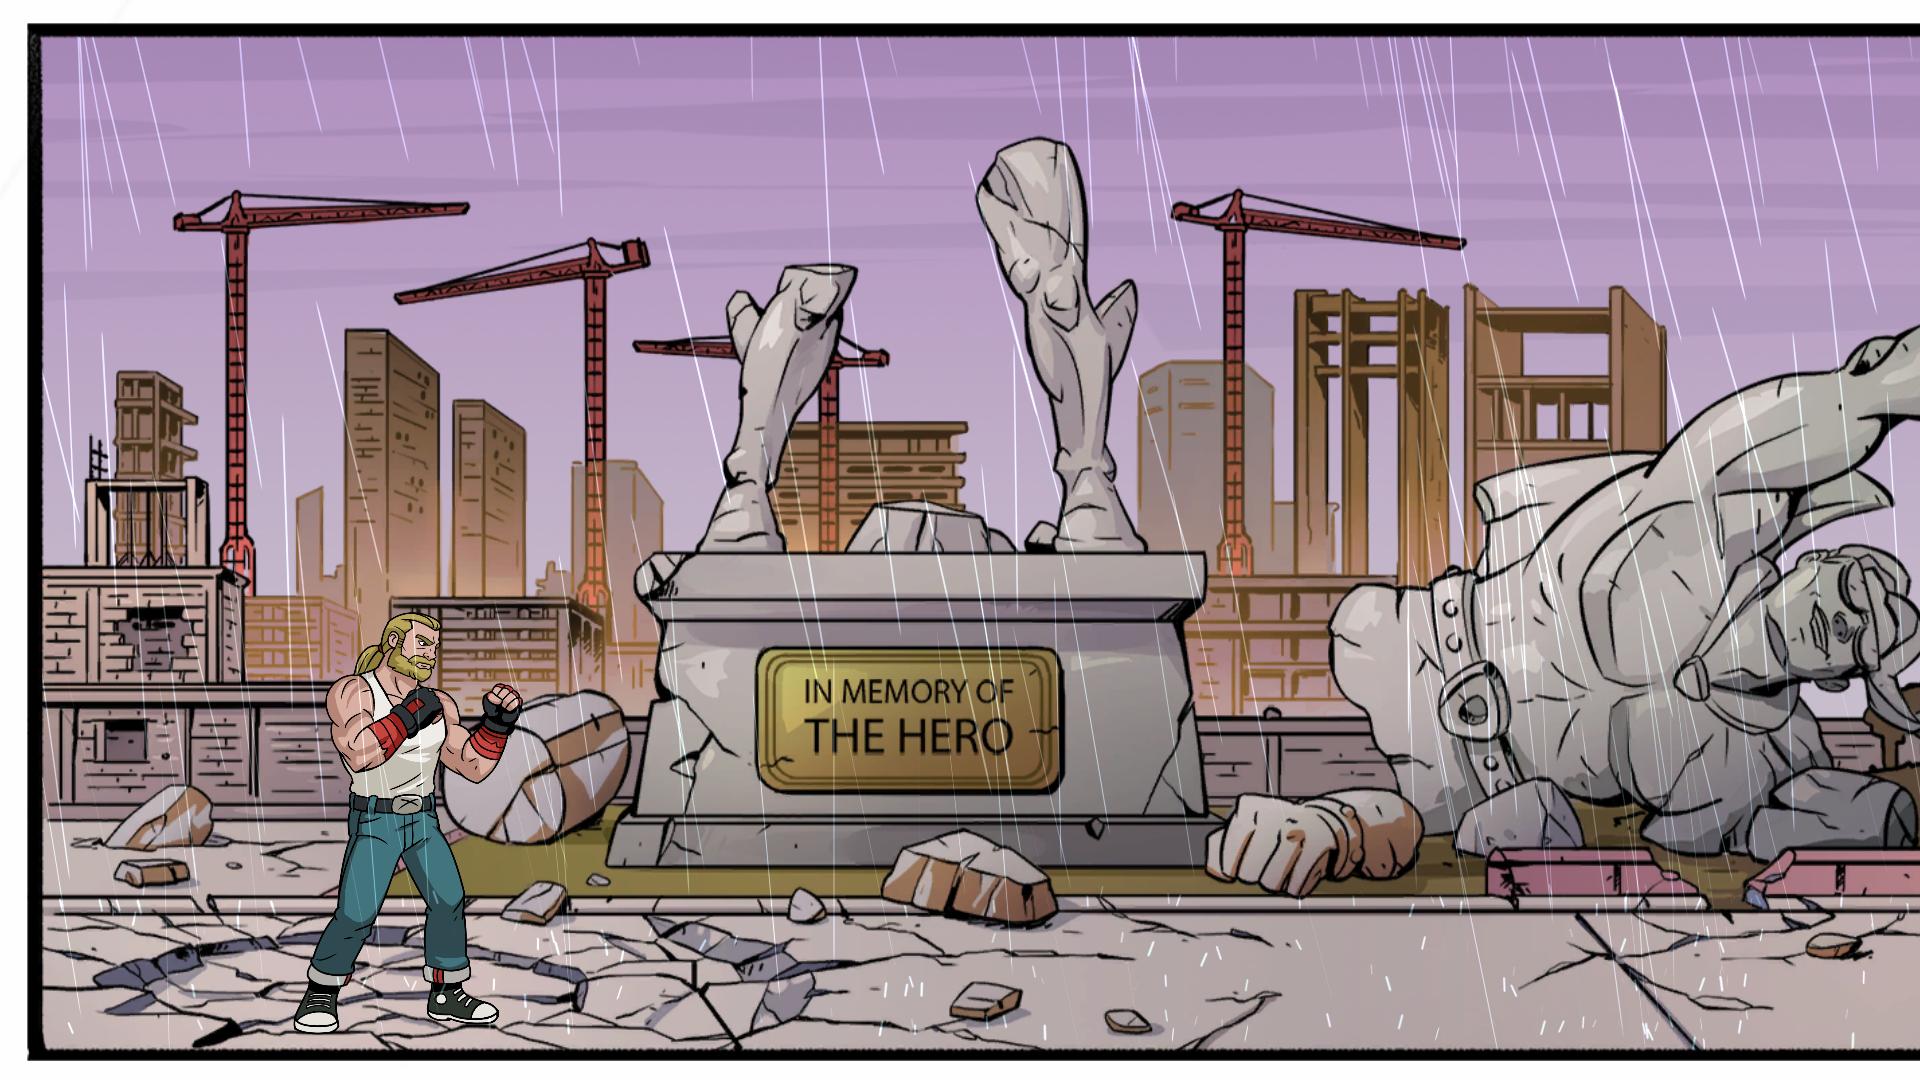 Estátua derrubada